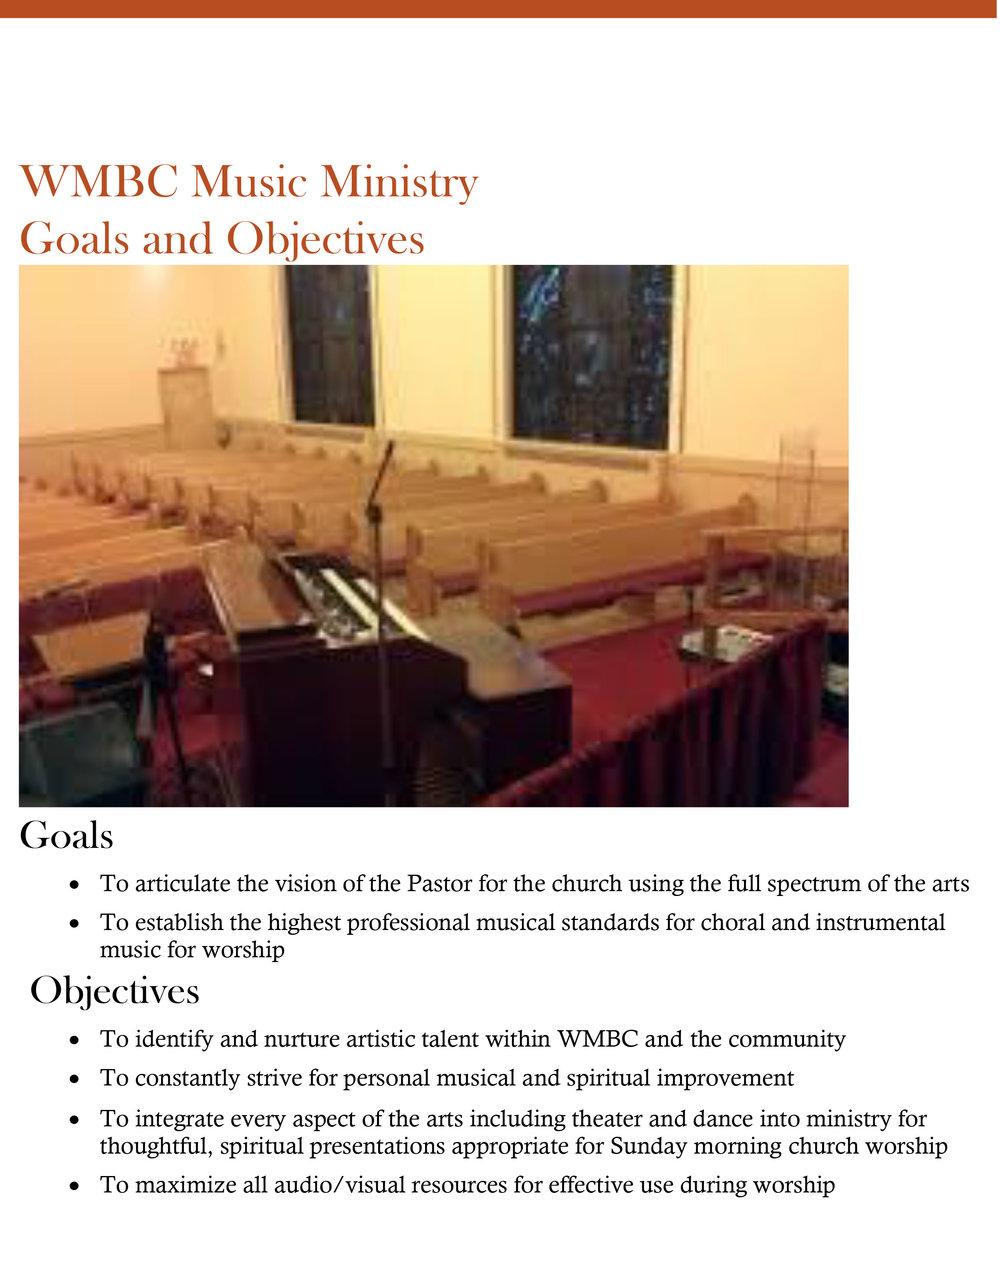 WMBC Music Ministry Newsletter Feb 2017  (1)-3.jpg